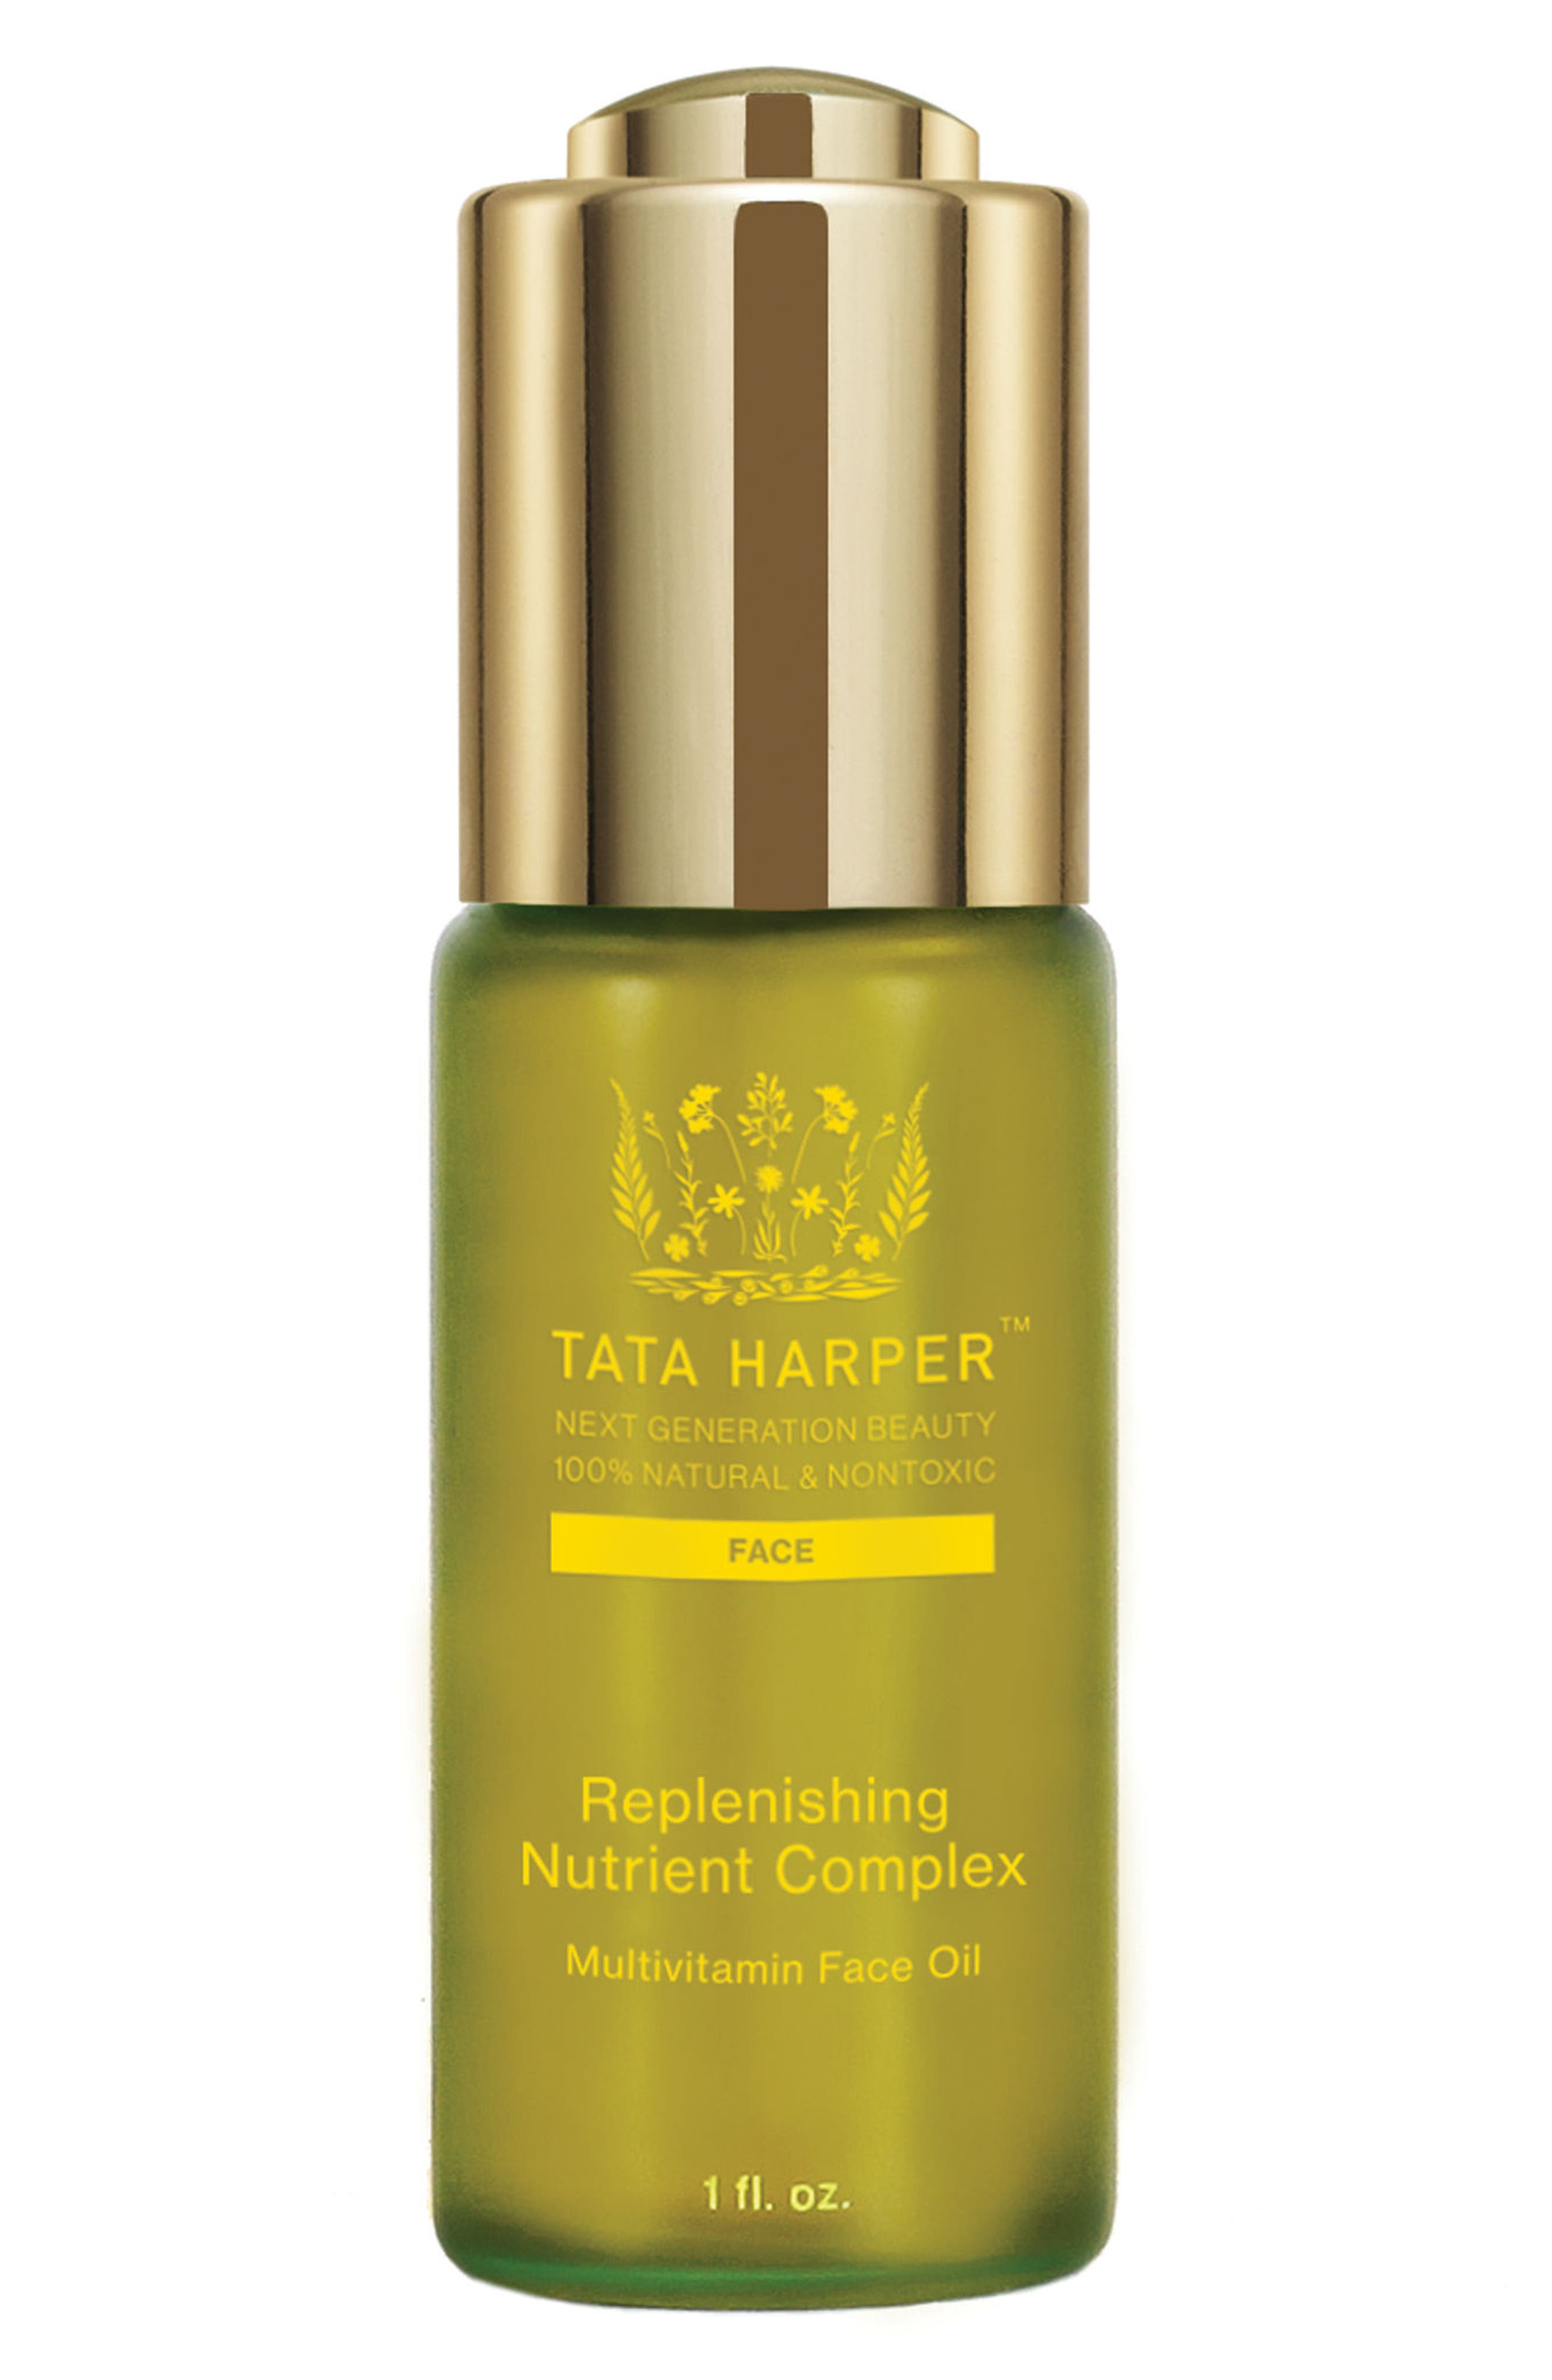 Tata Harper Skincare Replenishing Nutrient Complex